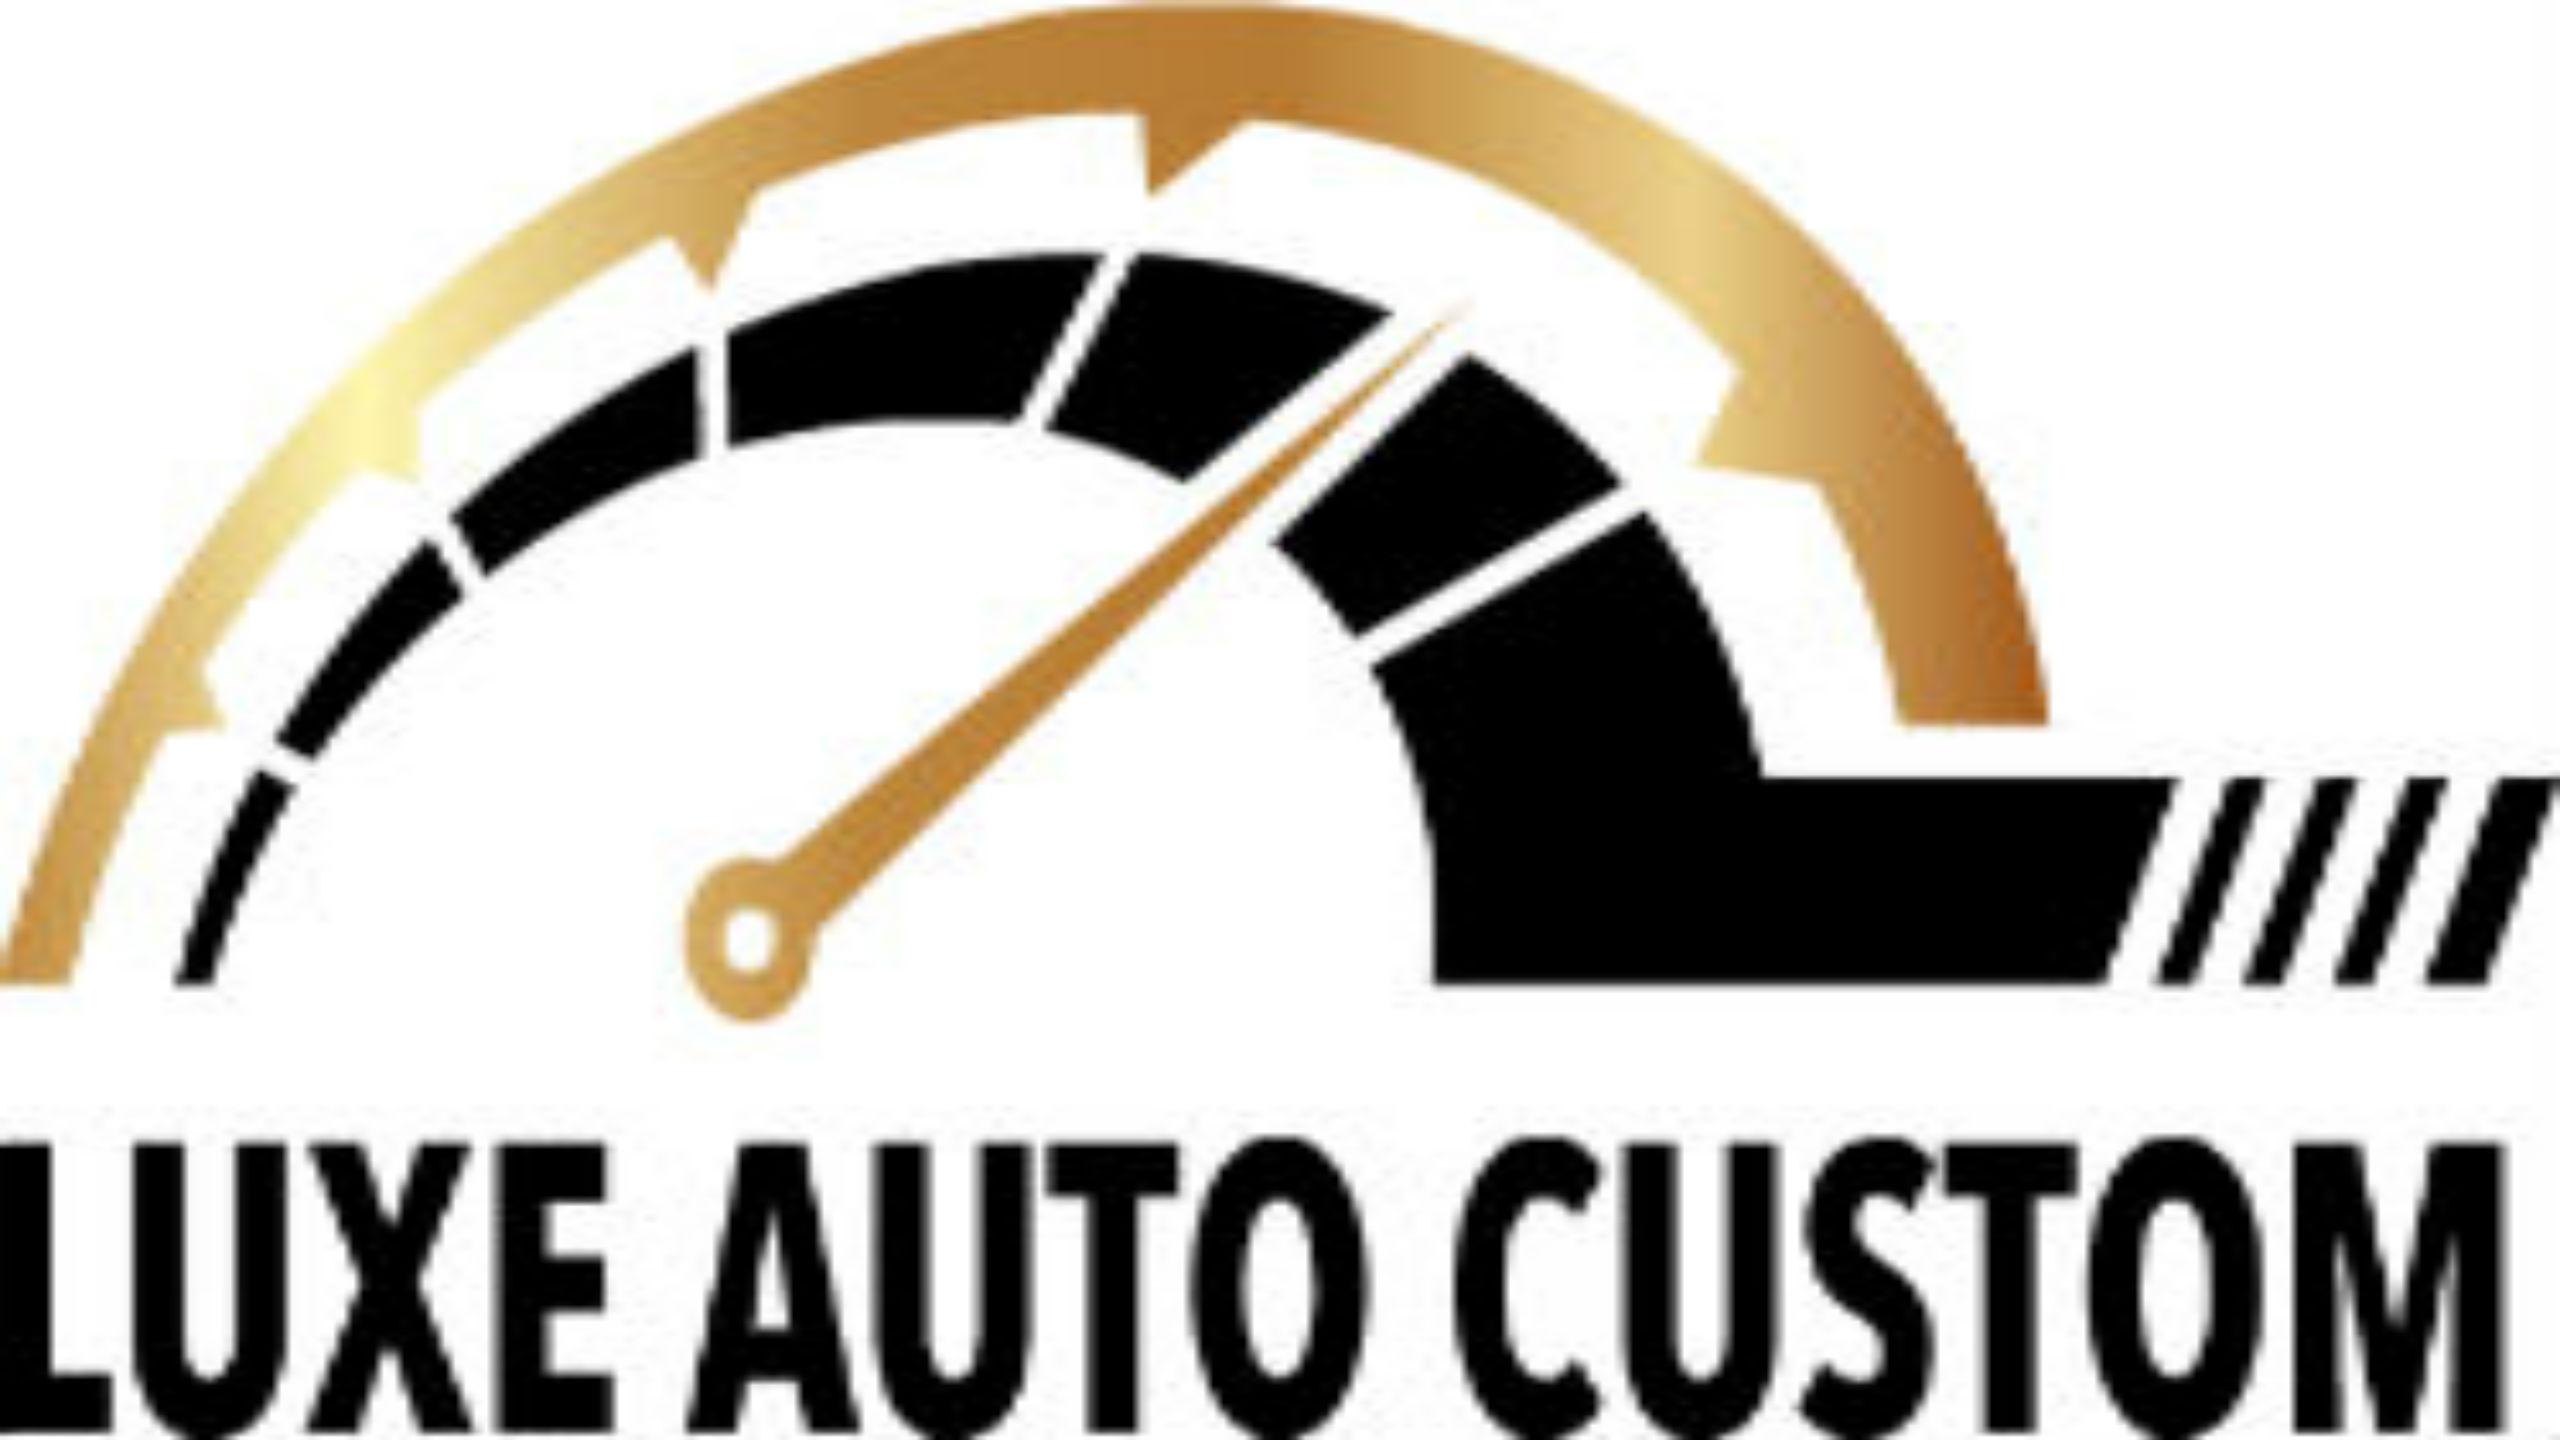 Luxe Auto Customs (@luxeautocustom) Cover Image